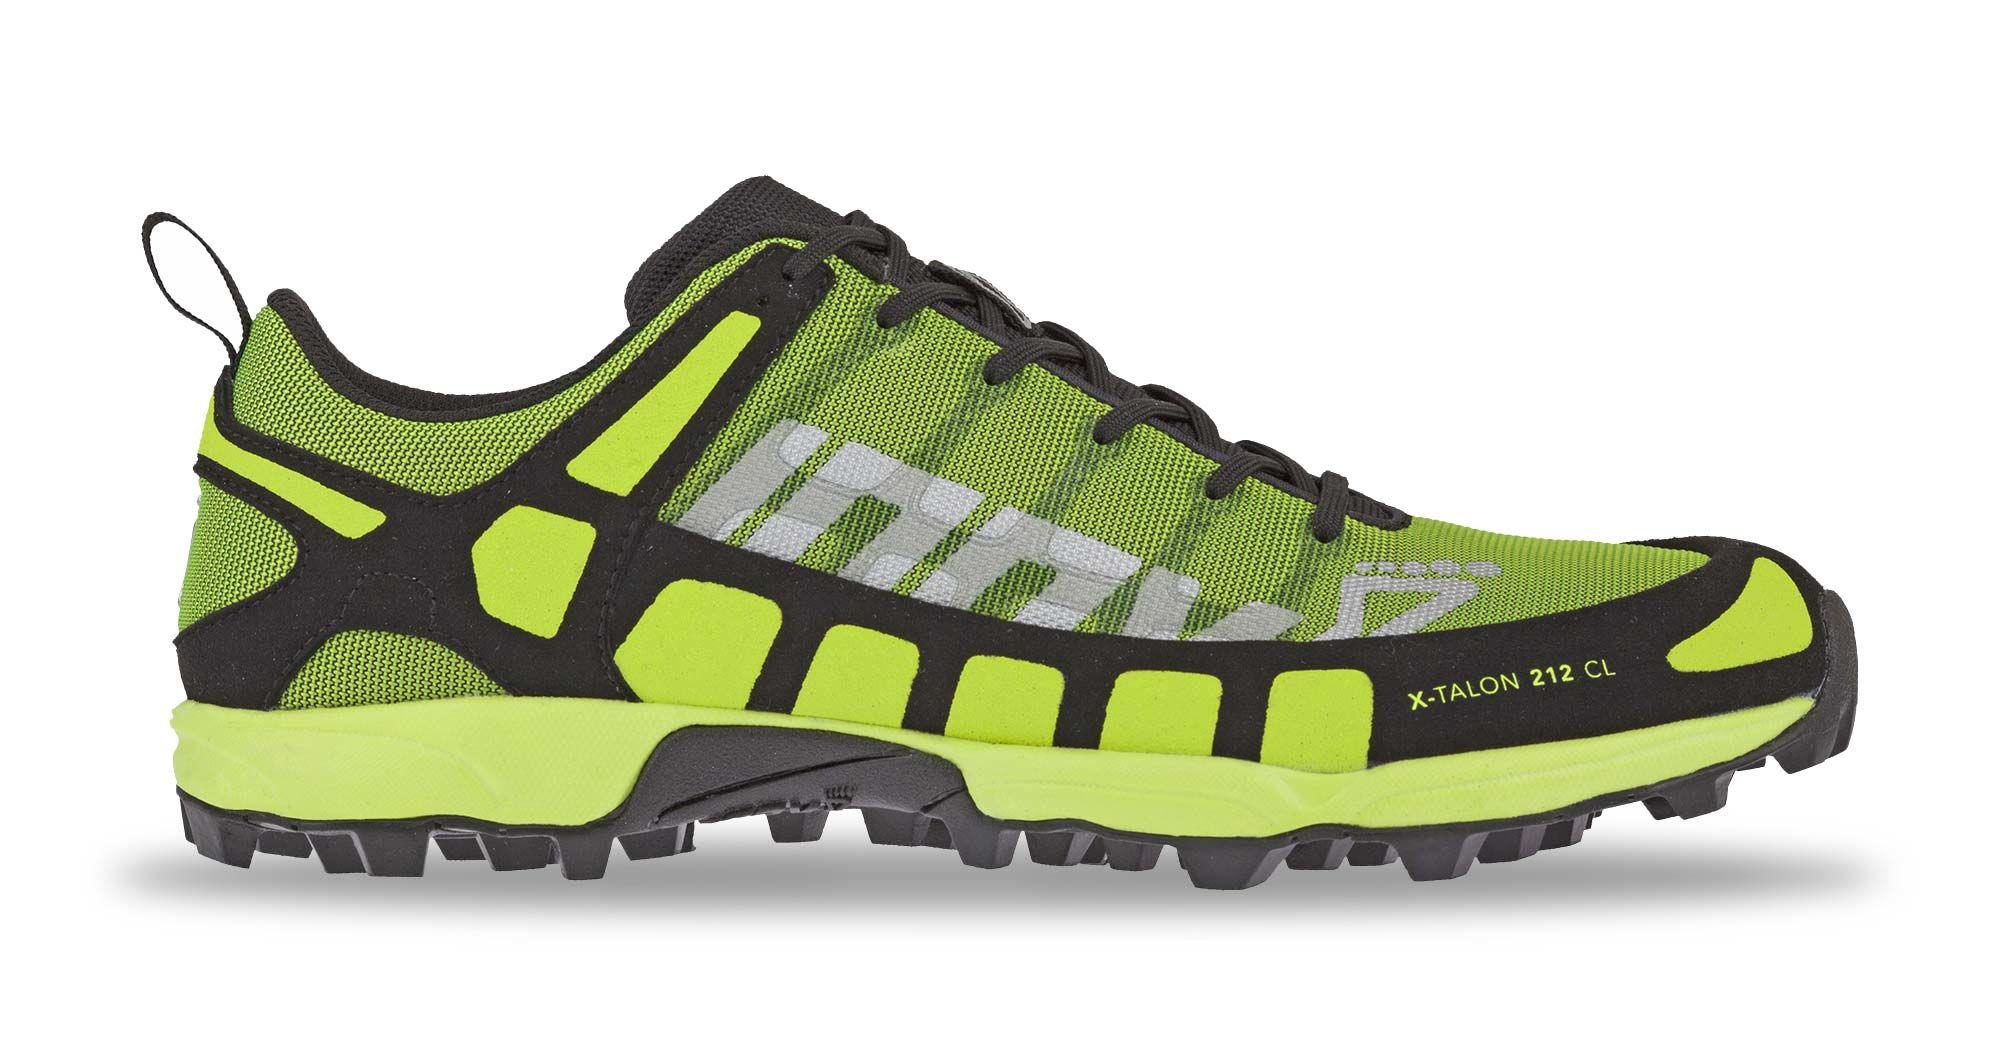 Inov-8 X-Talon 212 CL - Trail running shoes - Men's